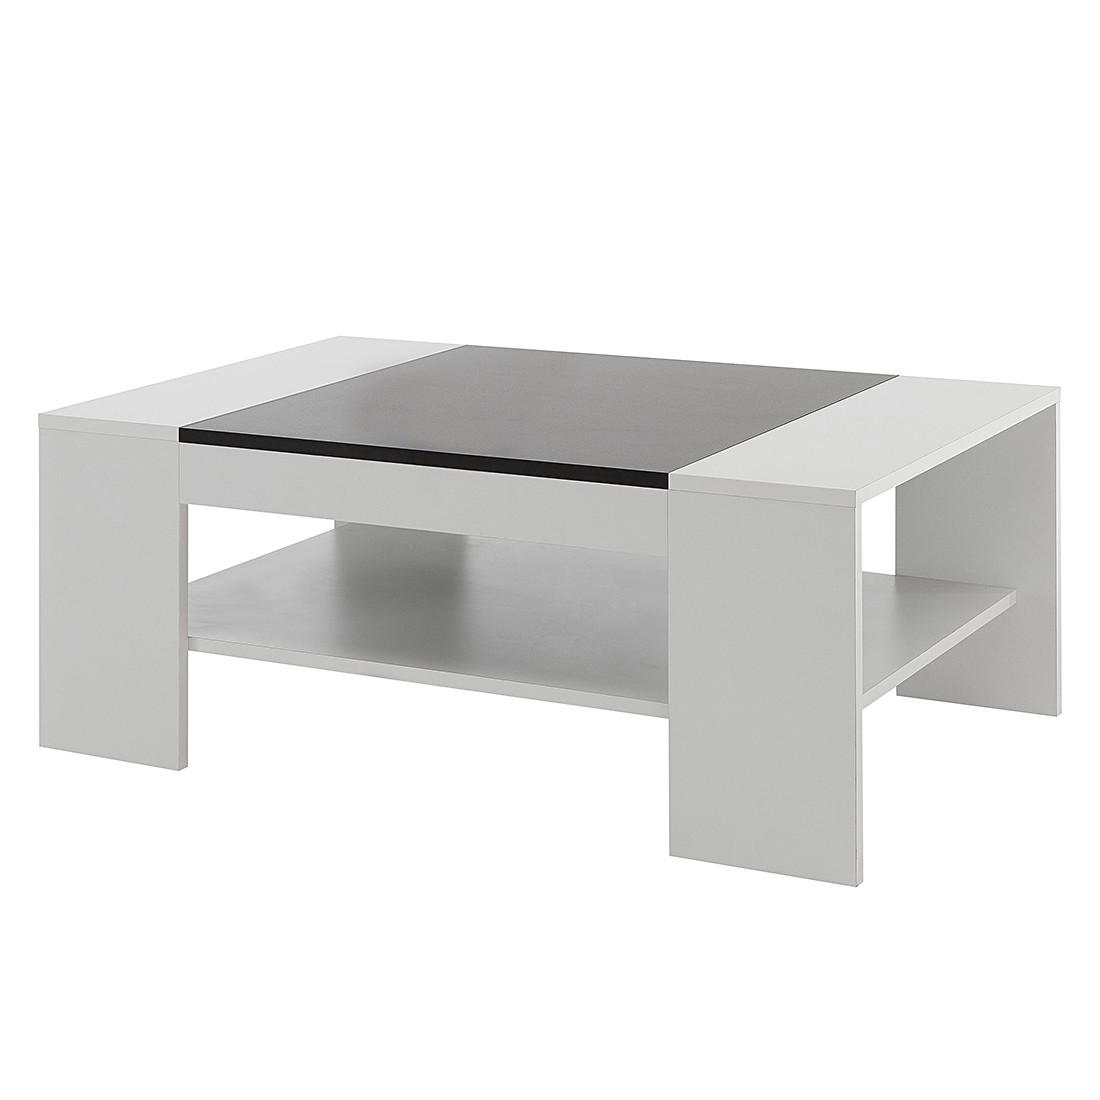 Tavolino da salotto Hays - Bianco/nero, Fredriks